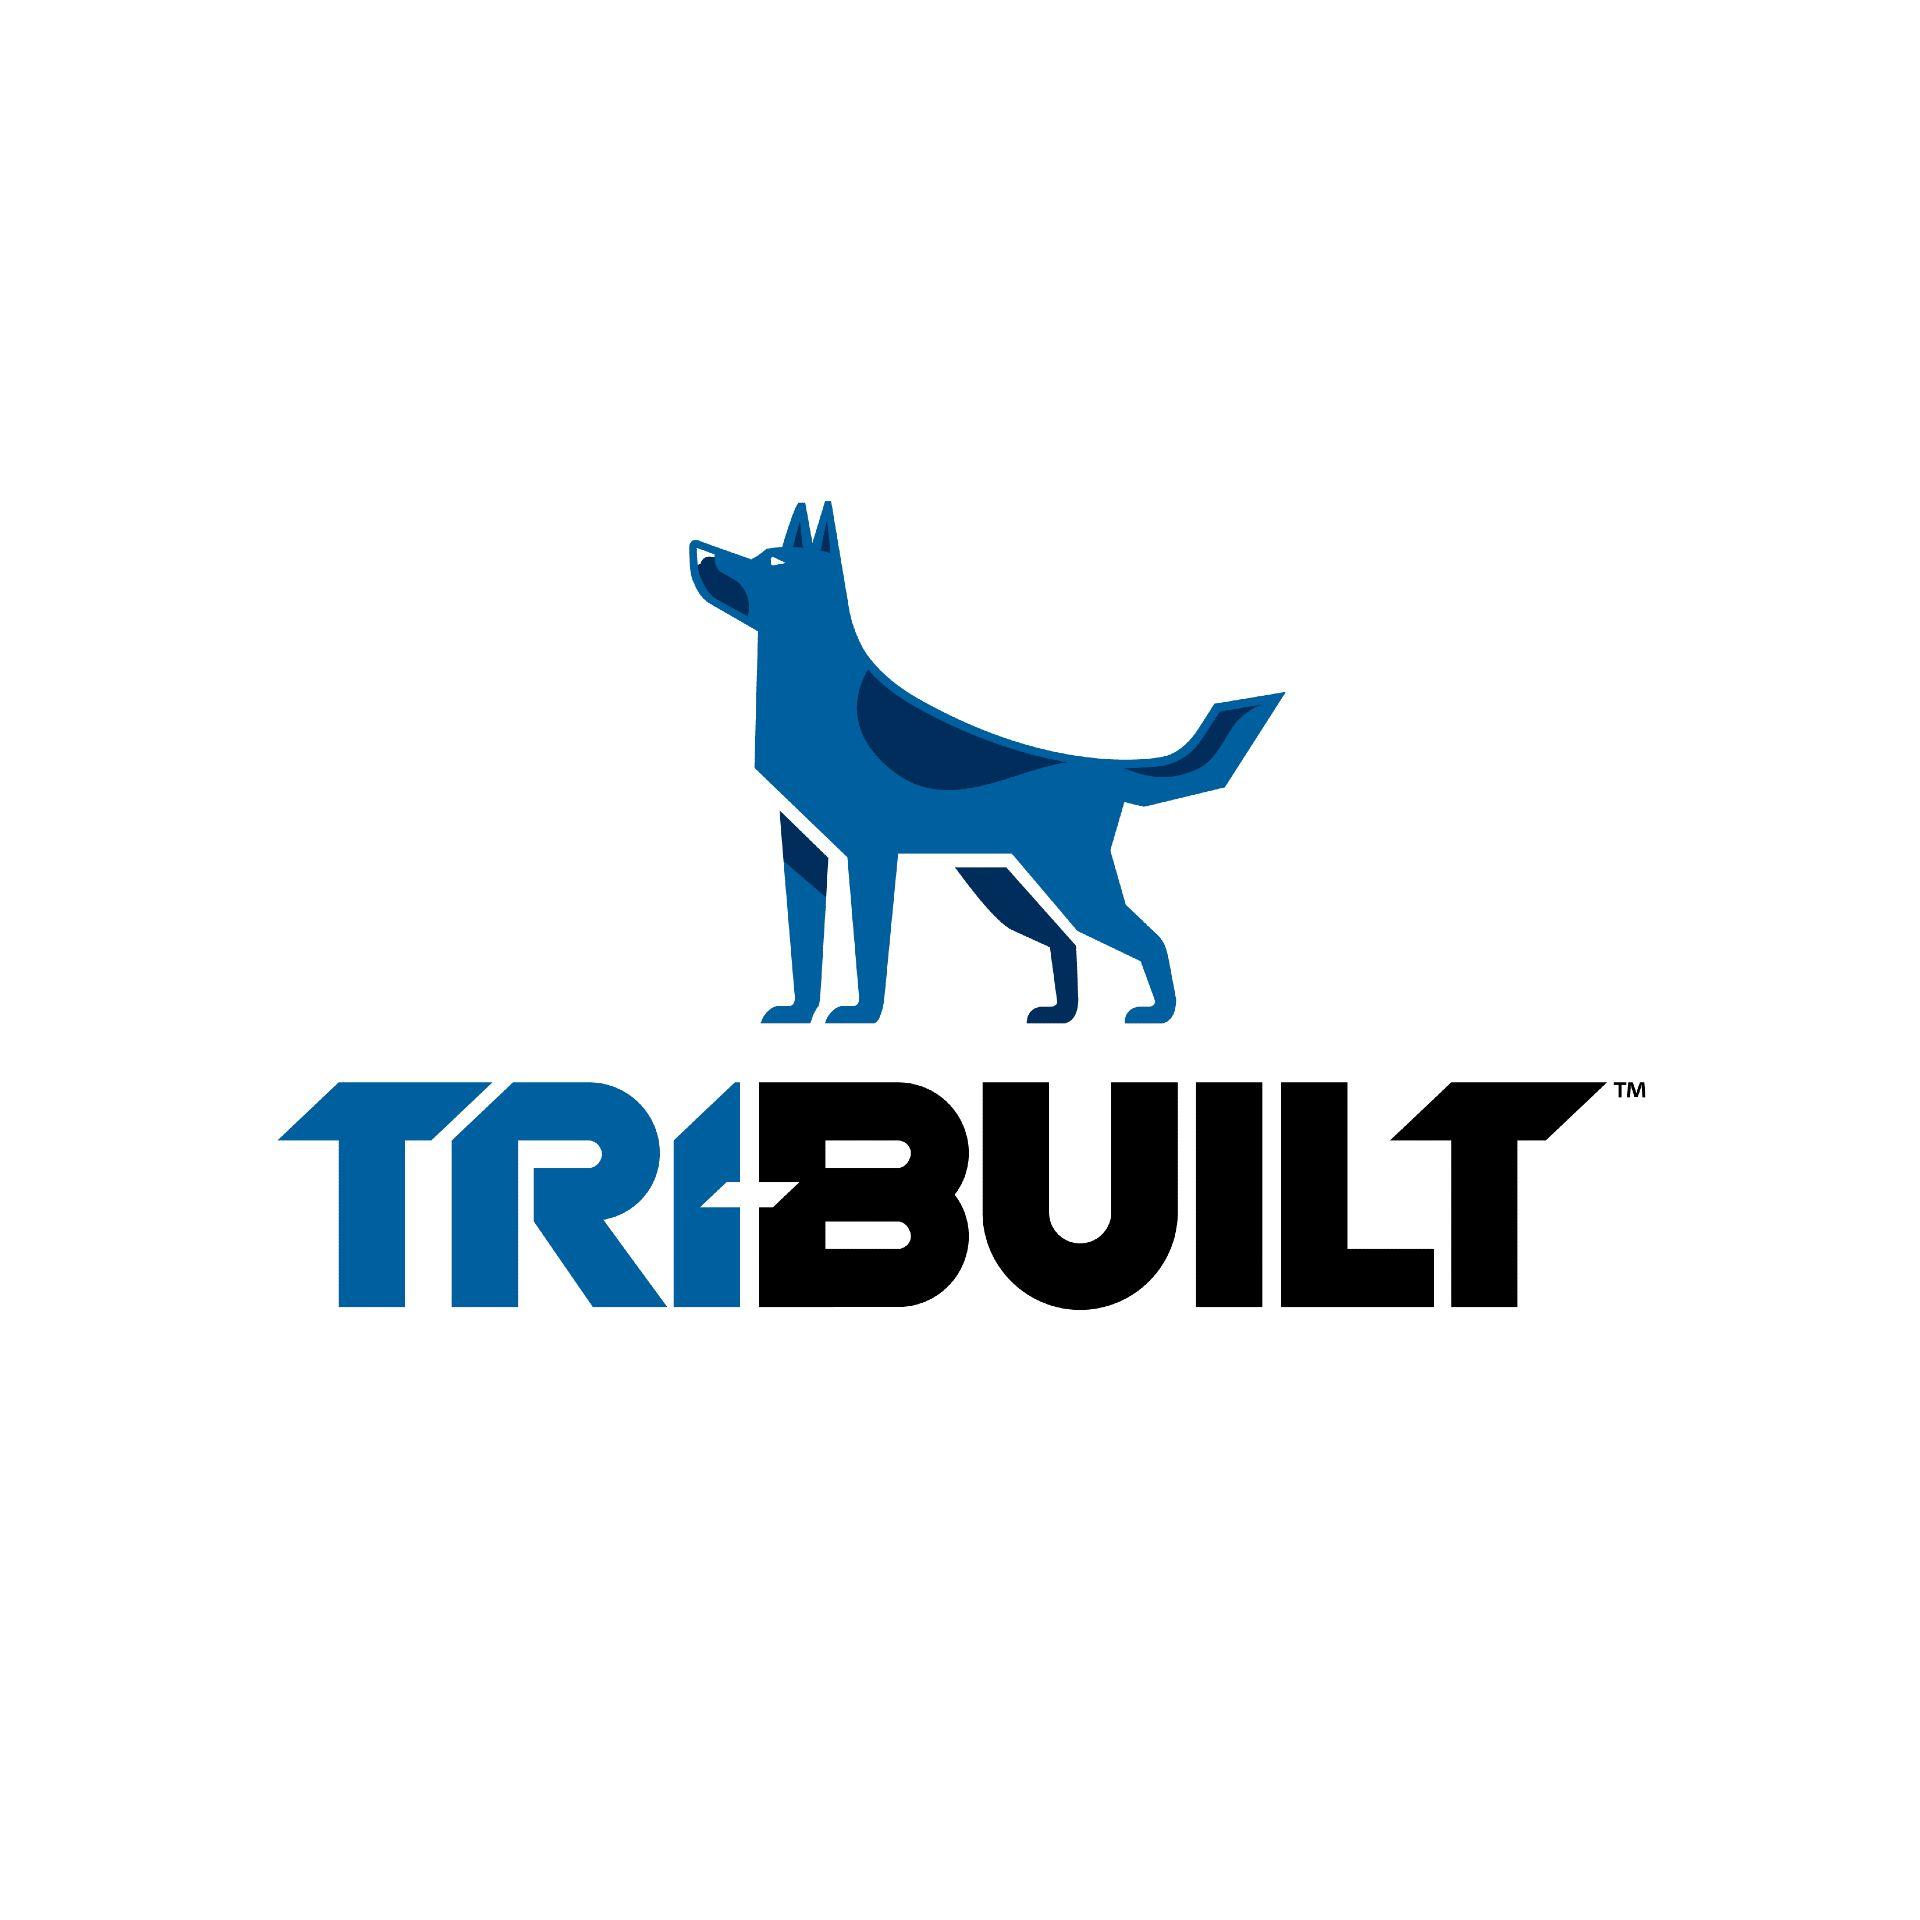 "TRI-BUILT .019"" x 3"" x 4"" x 10' Downspout 856"